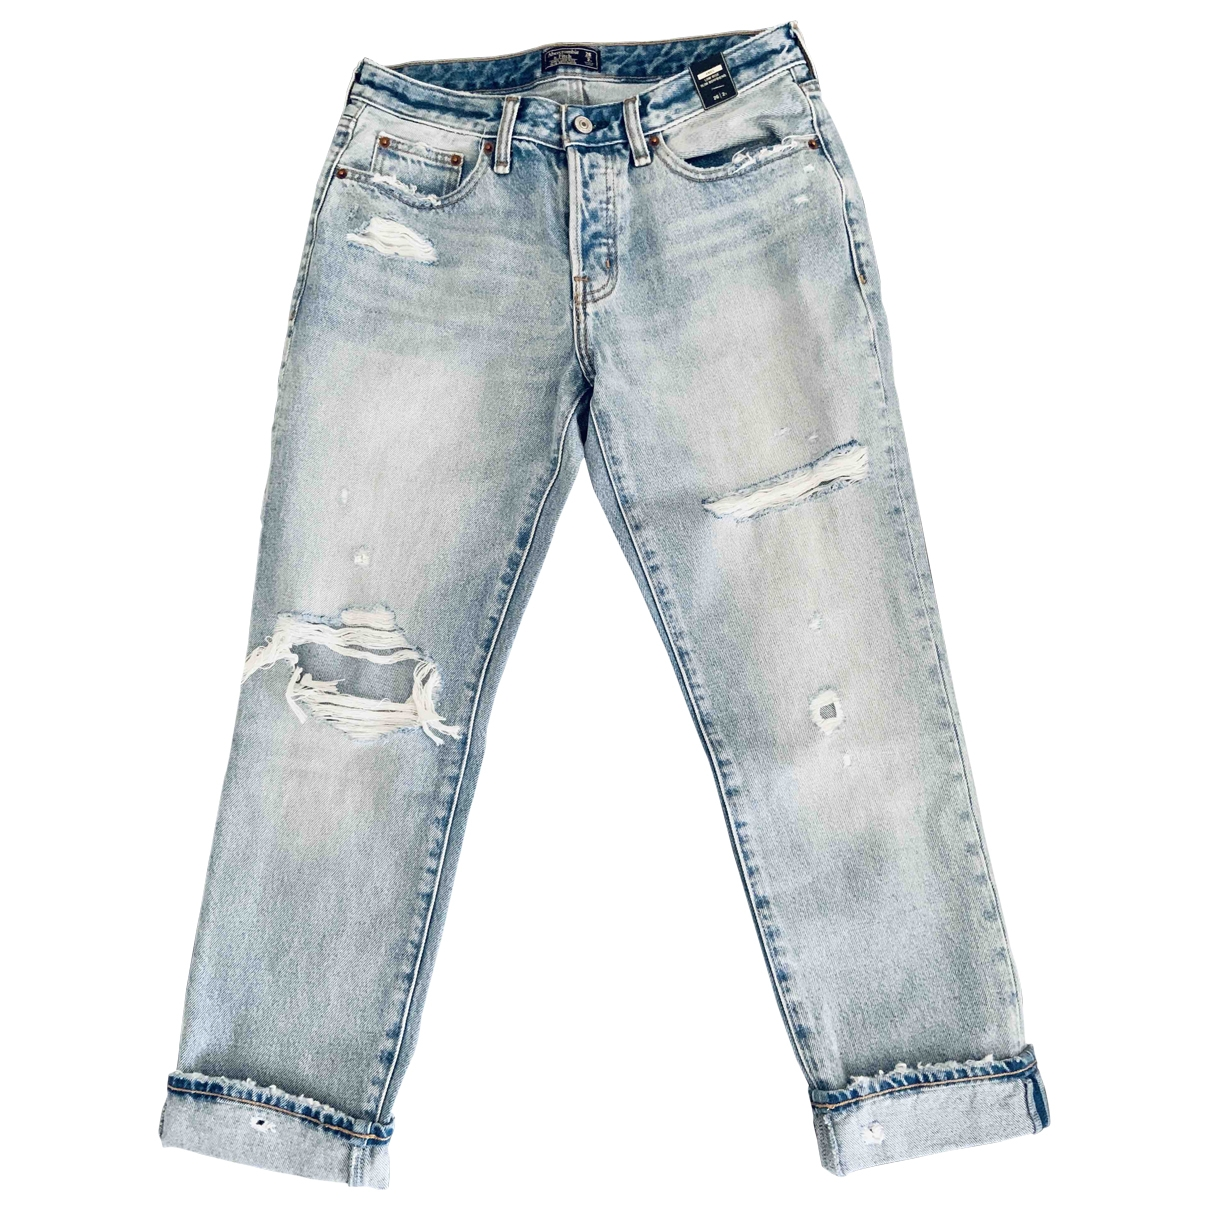 Abercrombie & Fitch \N Jeans in  Blau Denim - Jeans